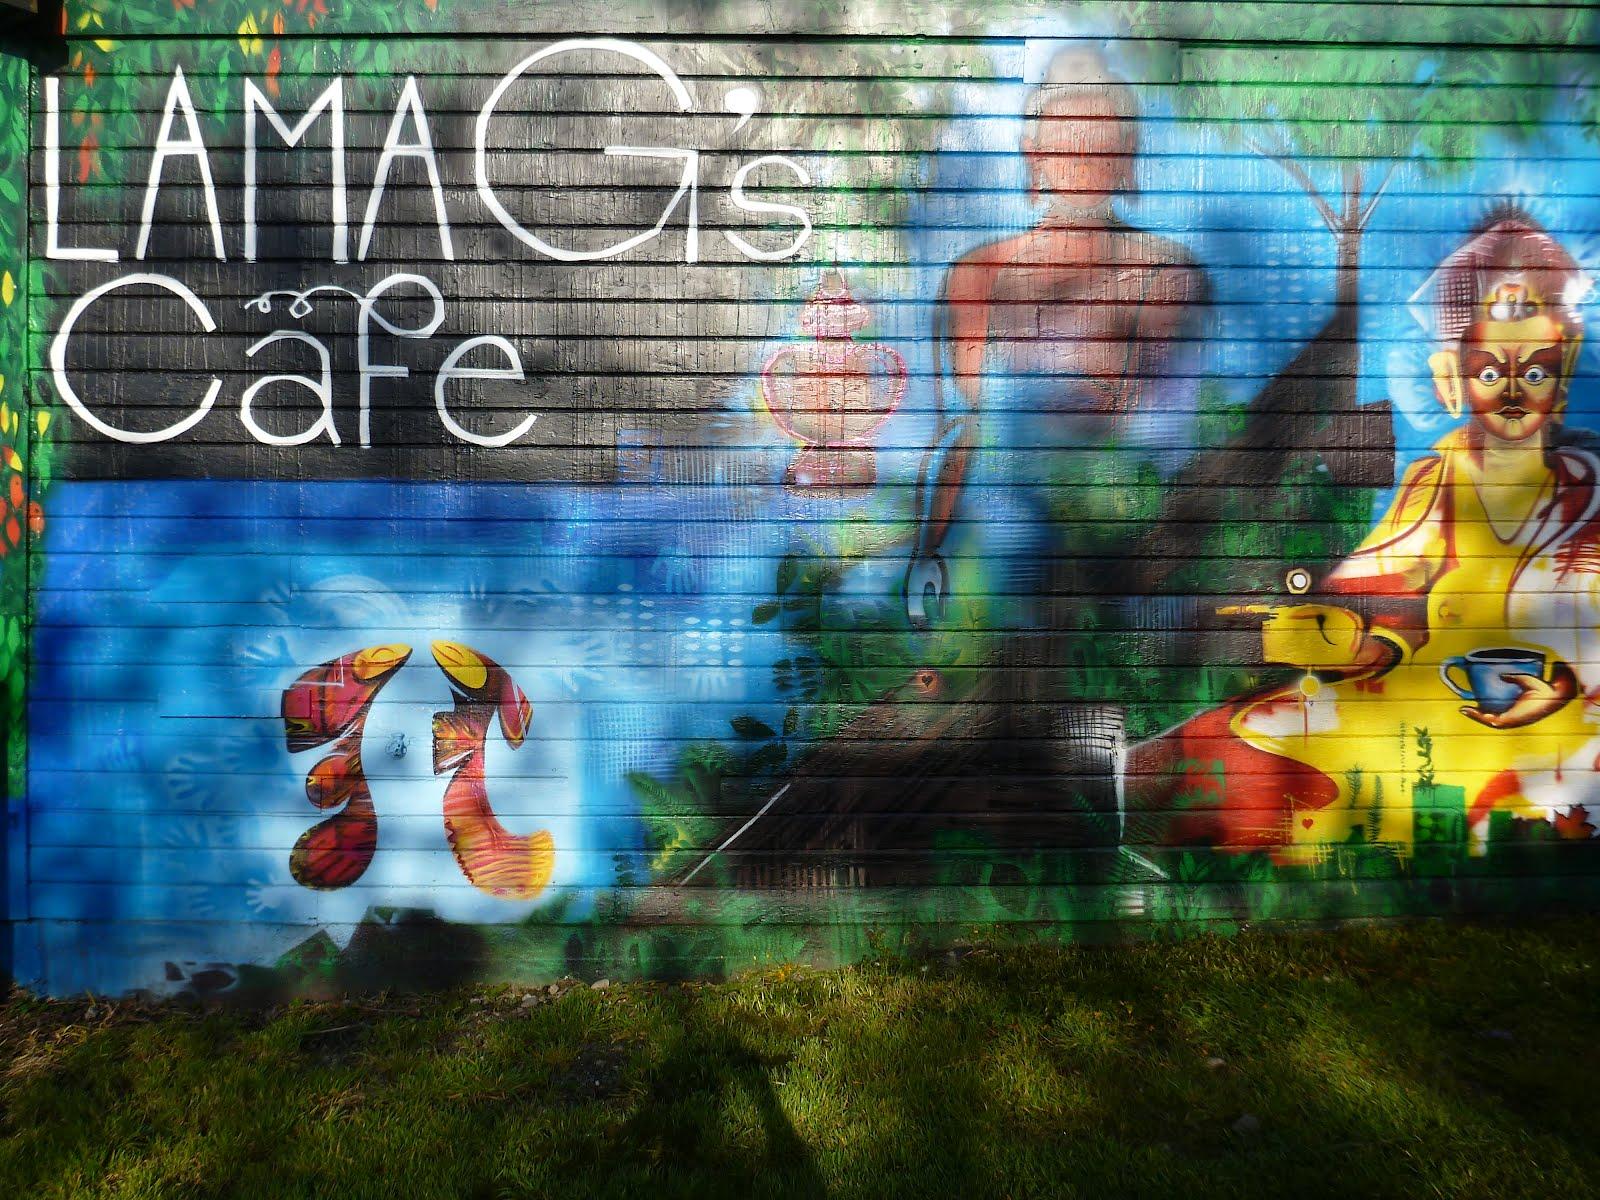 Lama G's Cafe Mural 2.JPG